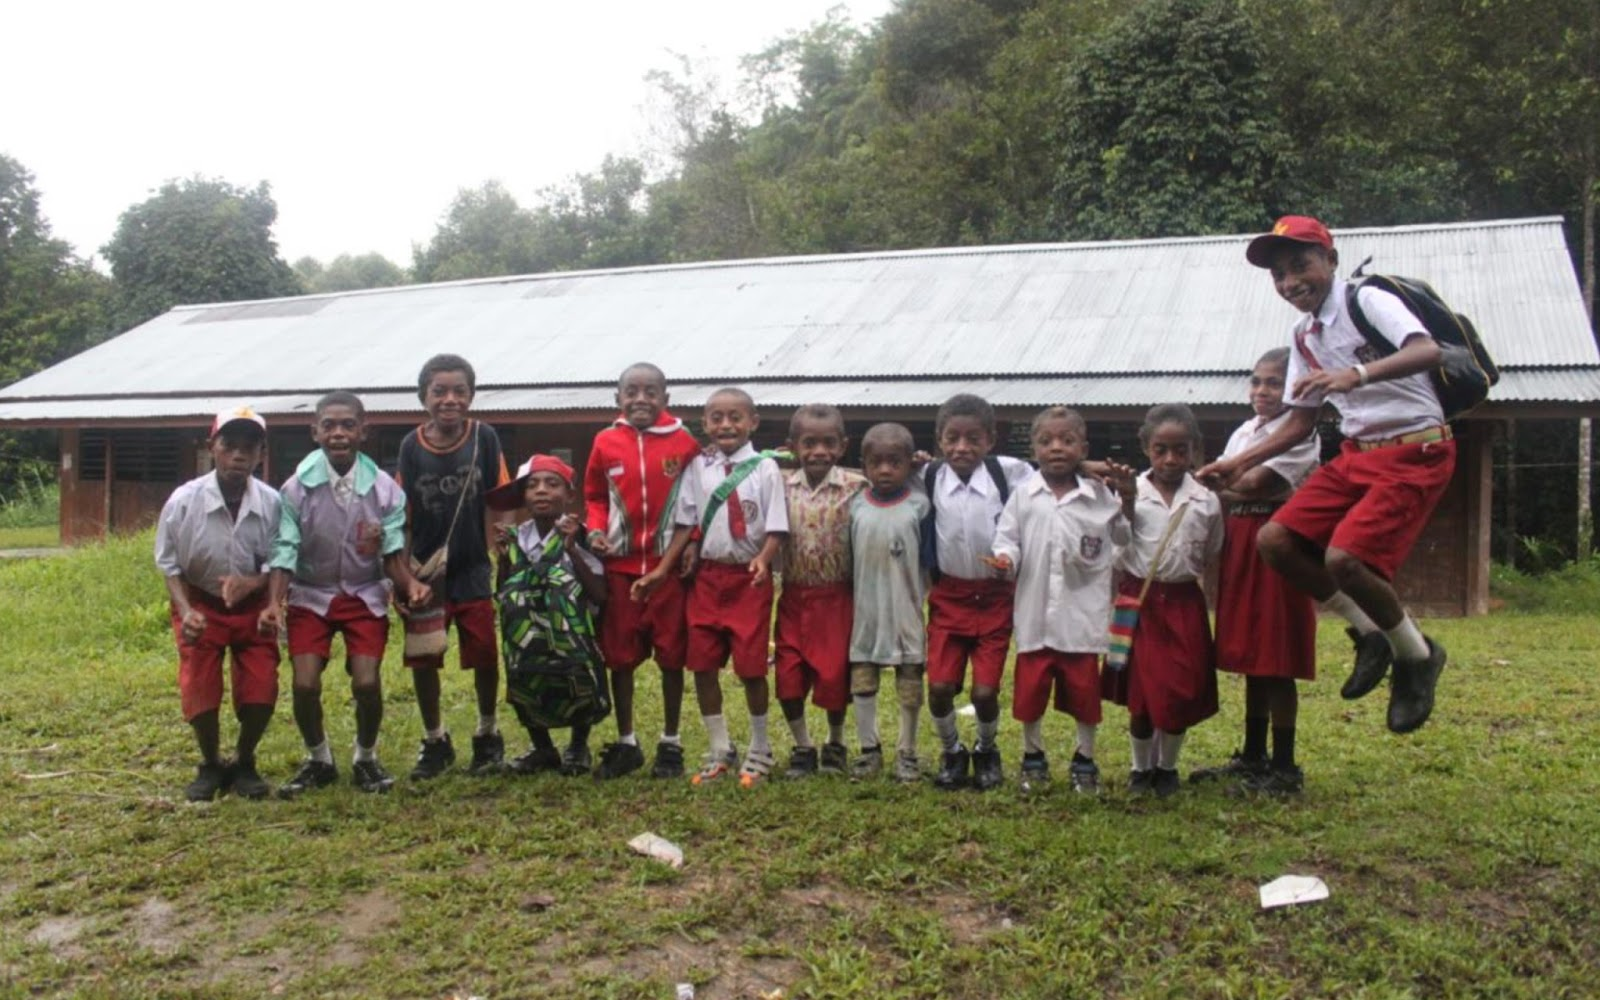 Anak-anak SD Yensei Teluk Bintuni Papua Barat project perpustakaan Book for Mountain